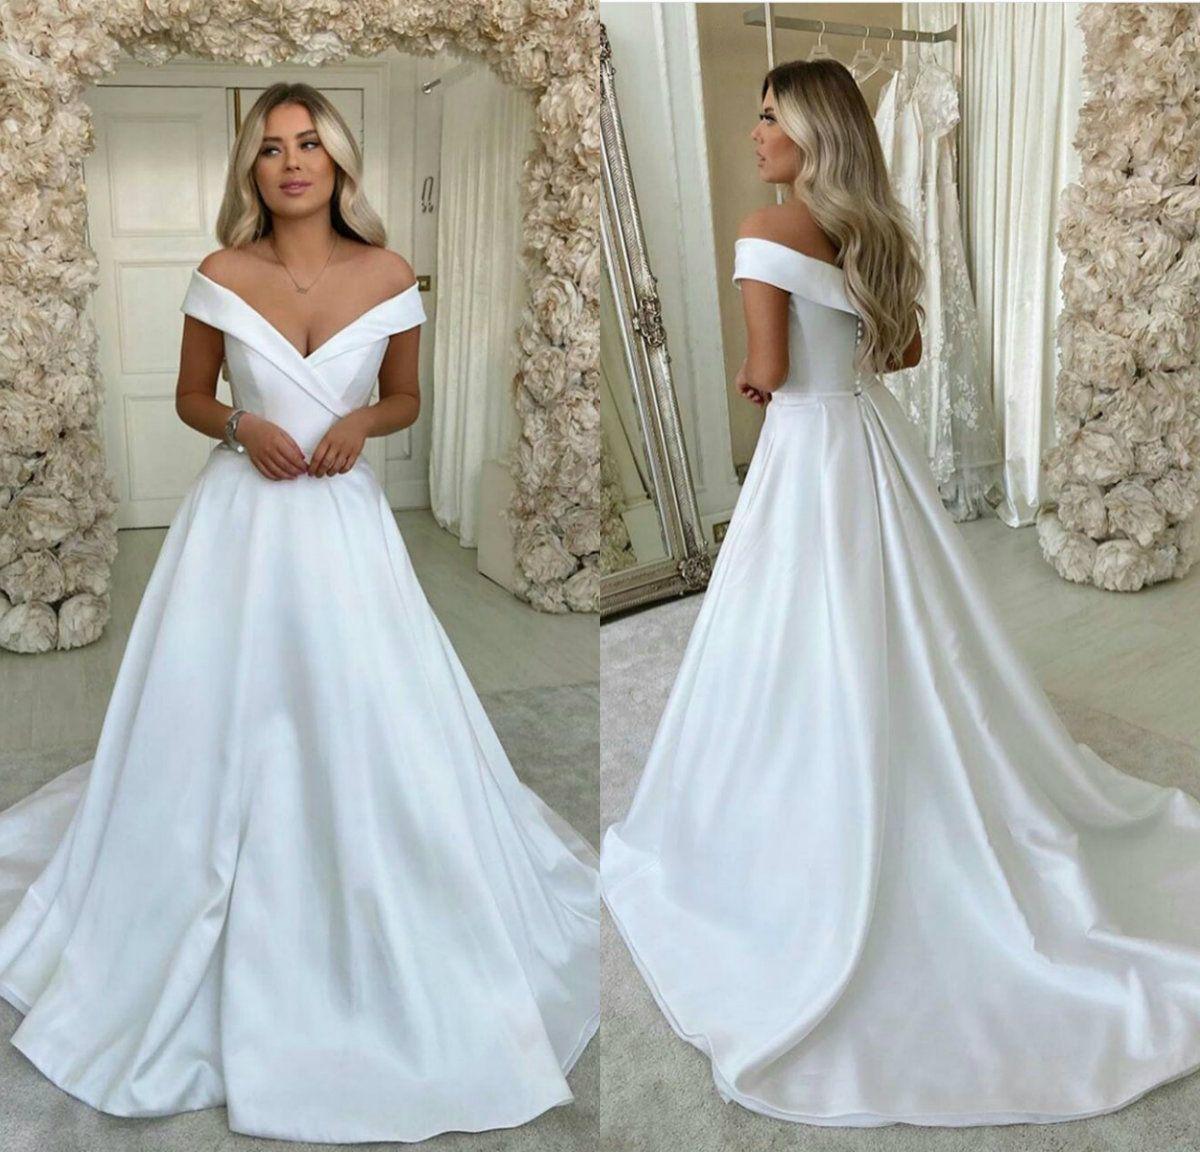 New Cheap Wedding Dresses Satin A Line Custom Made Beach Robes De Mariée Custom Made Plus Size Boho Bridal Gowns